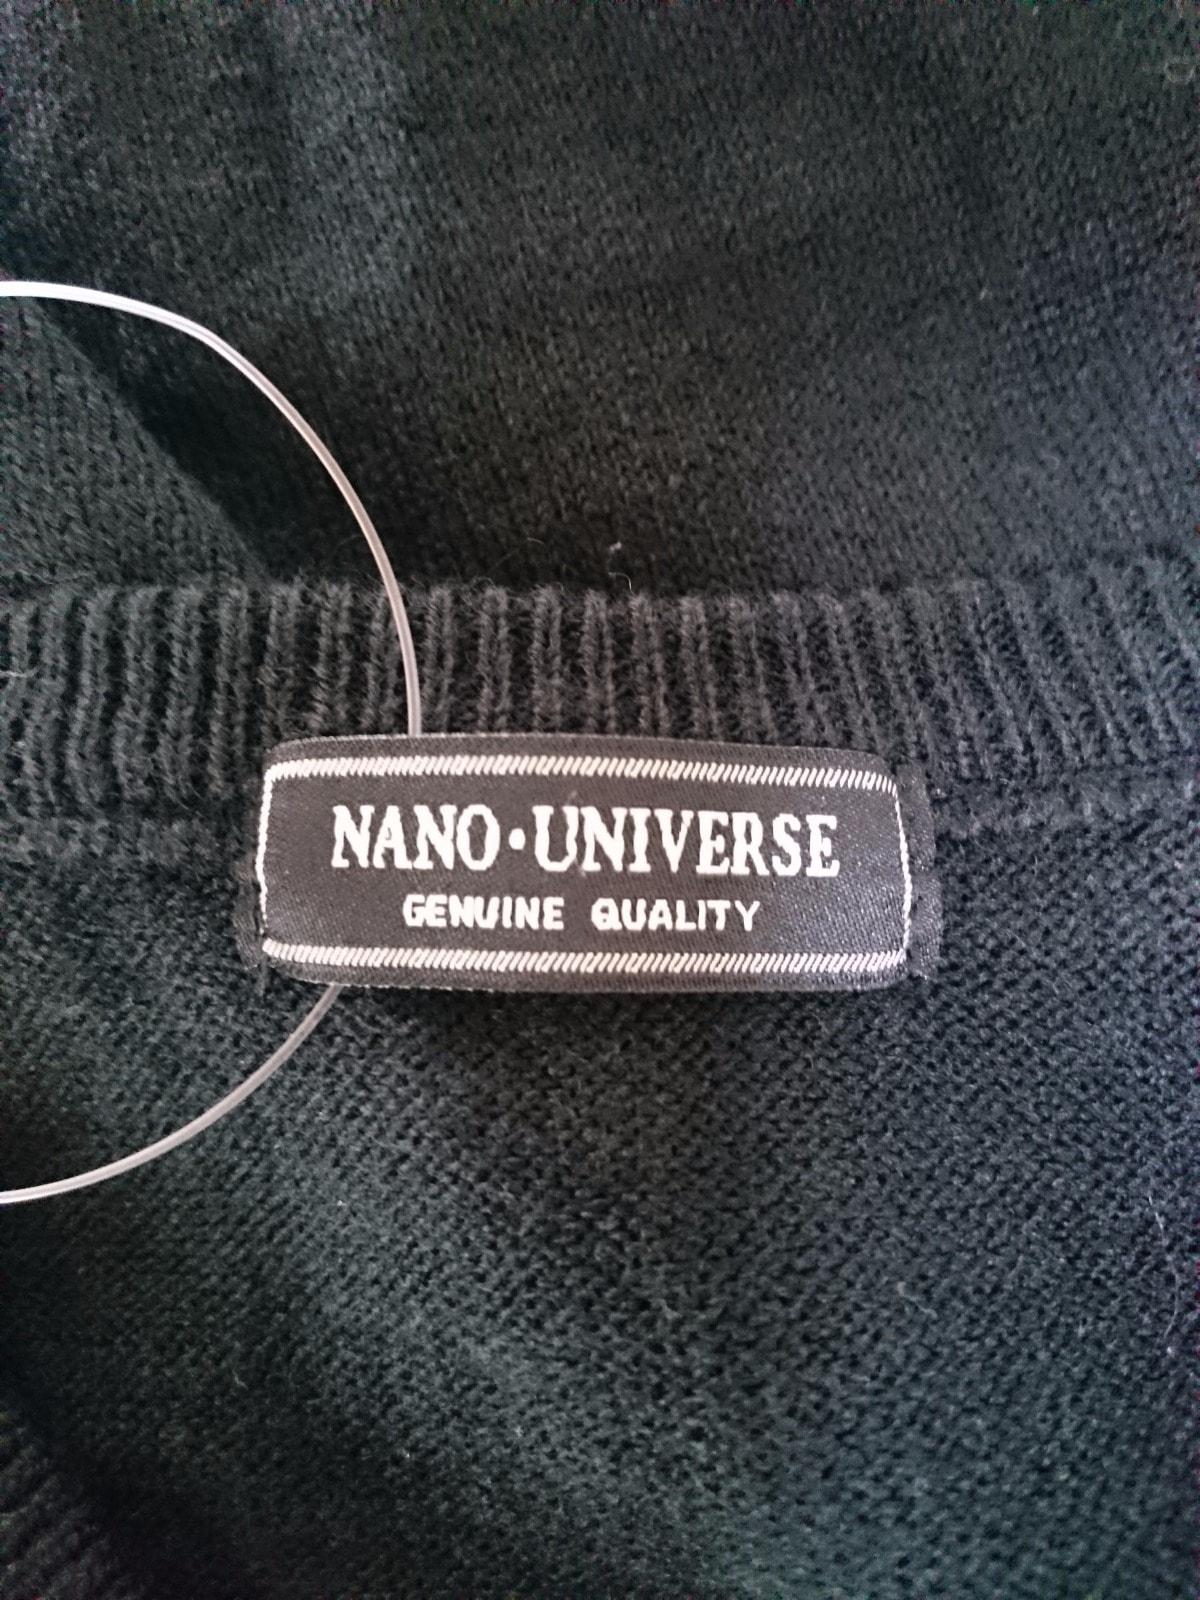 nano universe(ナノユニバース)のセーター